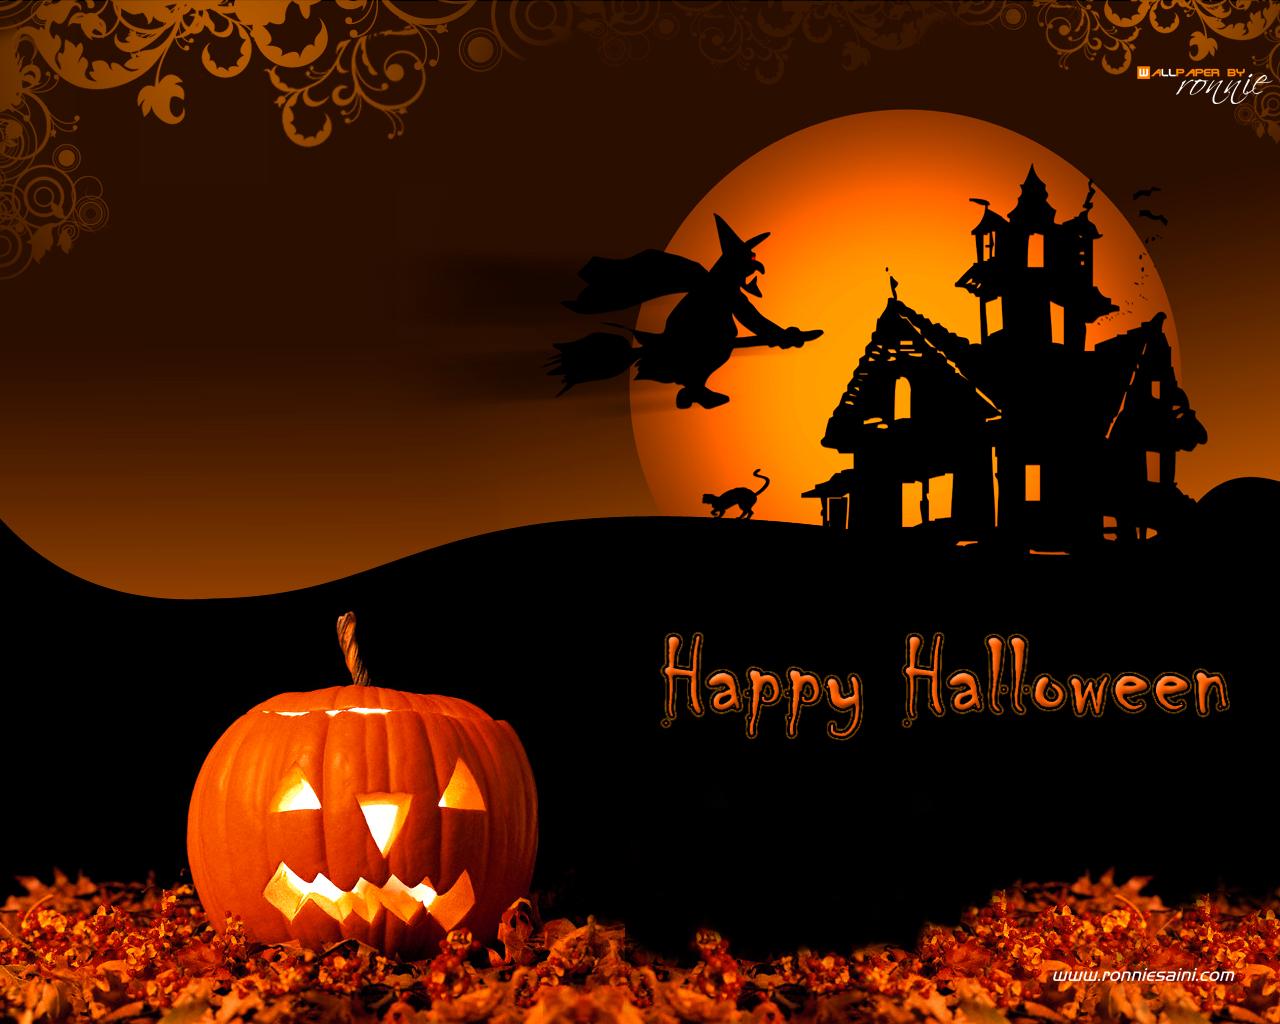 http://1.bp.blogspot.com/-ZNGBmlOhjJg/Tq9a6ZyQWuI/AAAAAAAAAxA/nZ4McjPeIzY/s1600/Happy_Halloween_28938.jpg